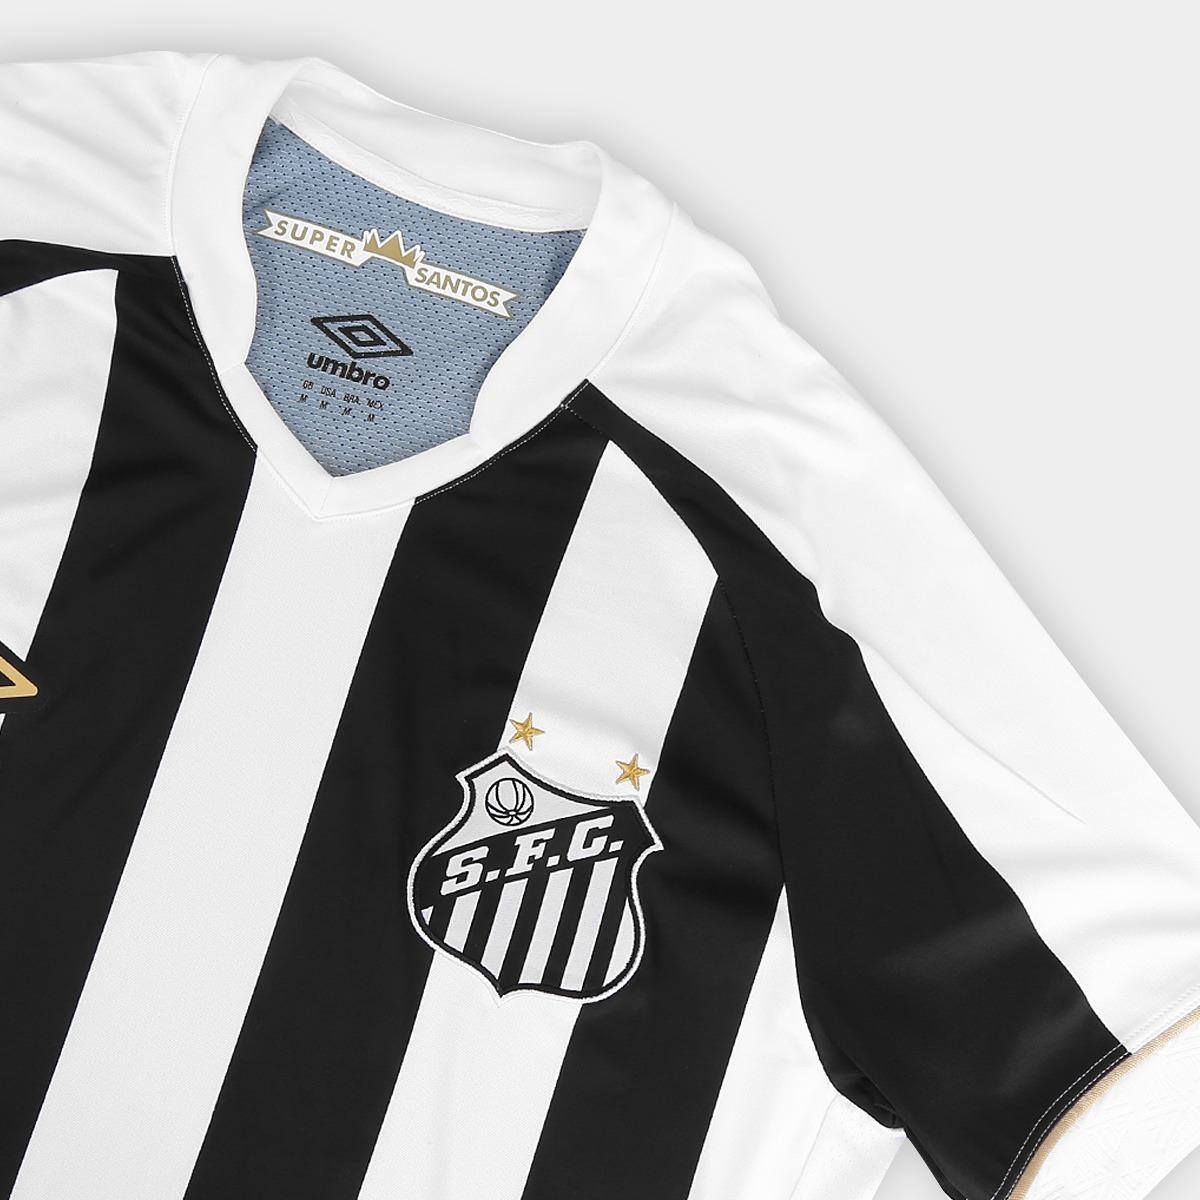 Camisa Santos 2018 S n° Torcedor Masculina Promoção Preto - R  129 ... bb2b6b02eebbb